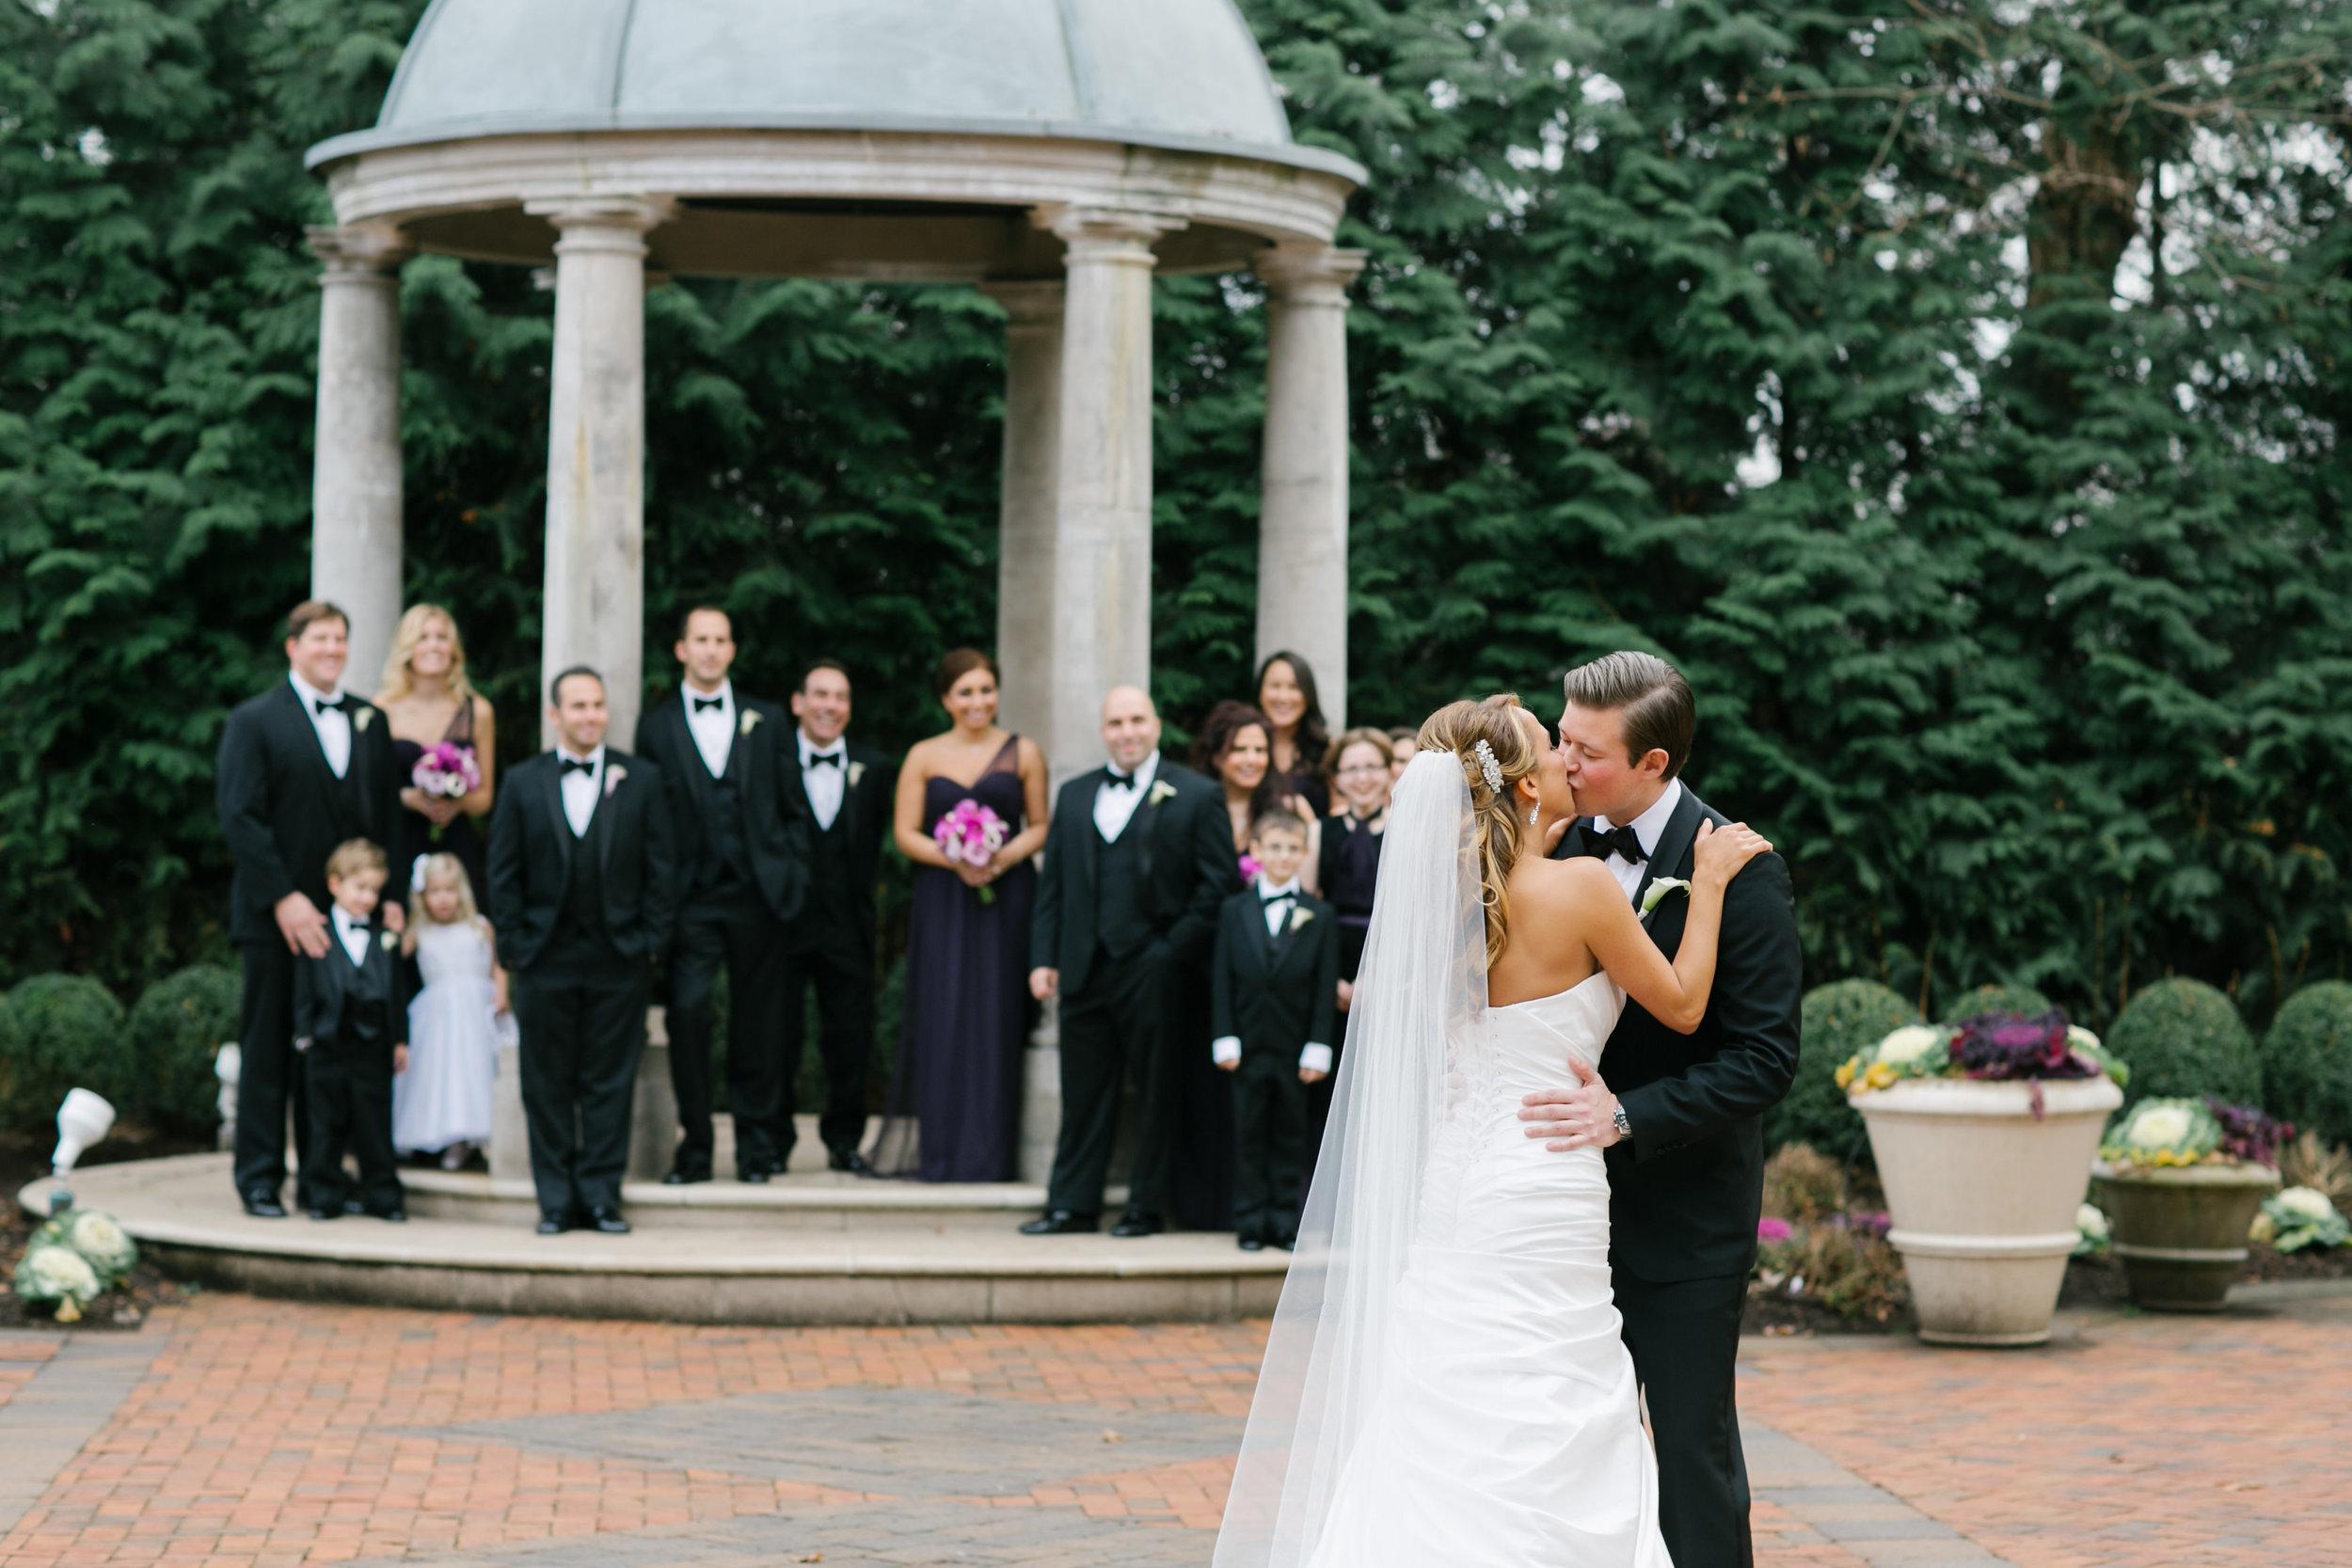 Ceci_New_York_Custom_Invitation_ New_Jersey_Wedding_Luxury_Personalized_Ceci_Style_Bride_Foil_Stamping26.jpg